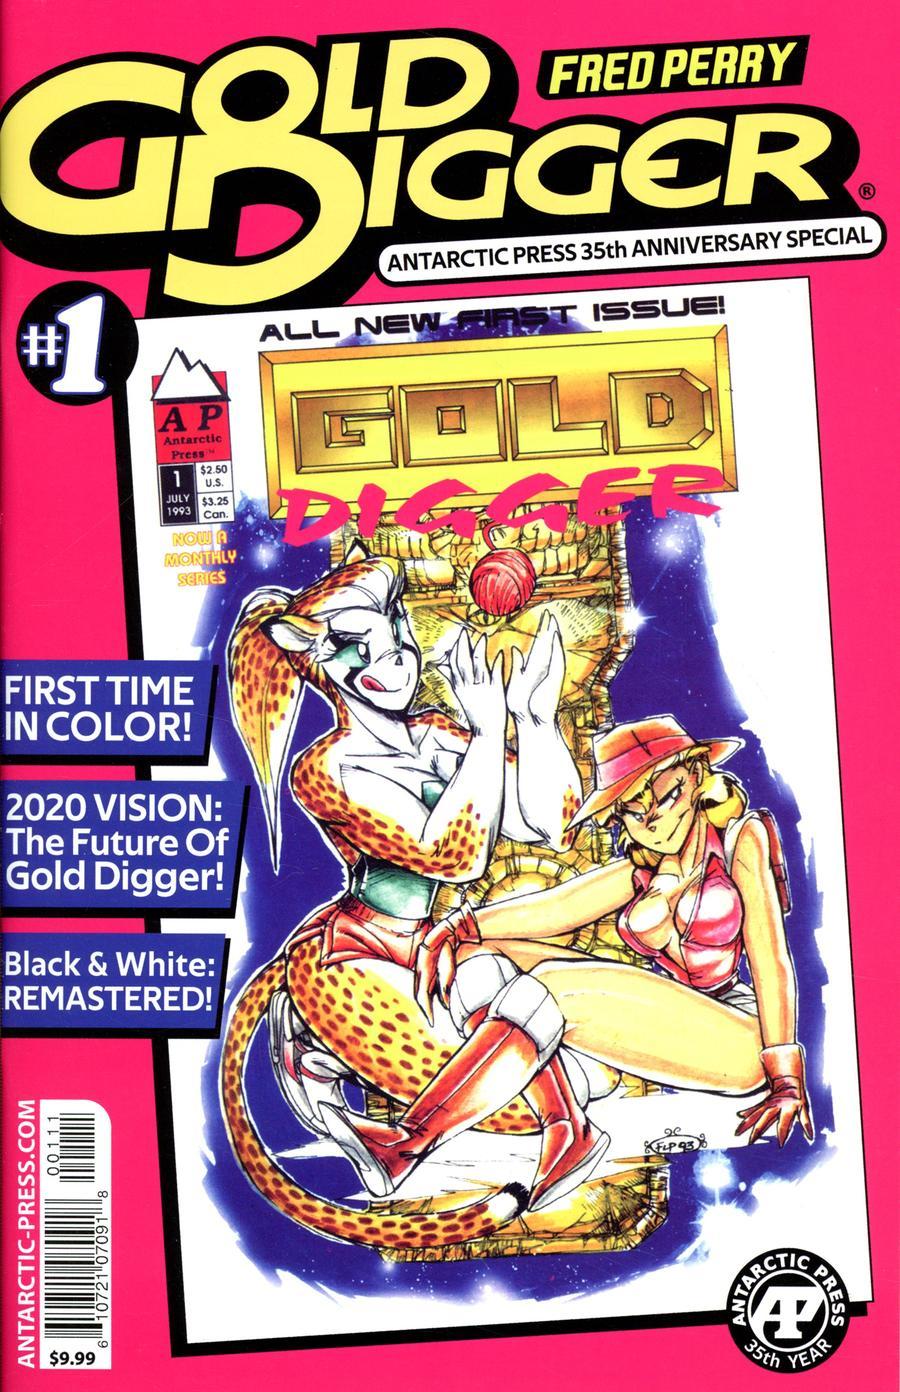 Gold Digger #1 Antarctic Press 35th Anniversary Special